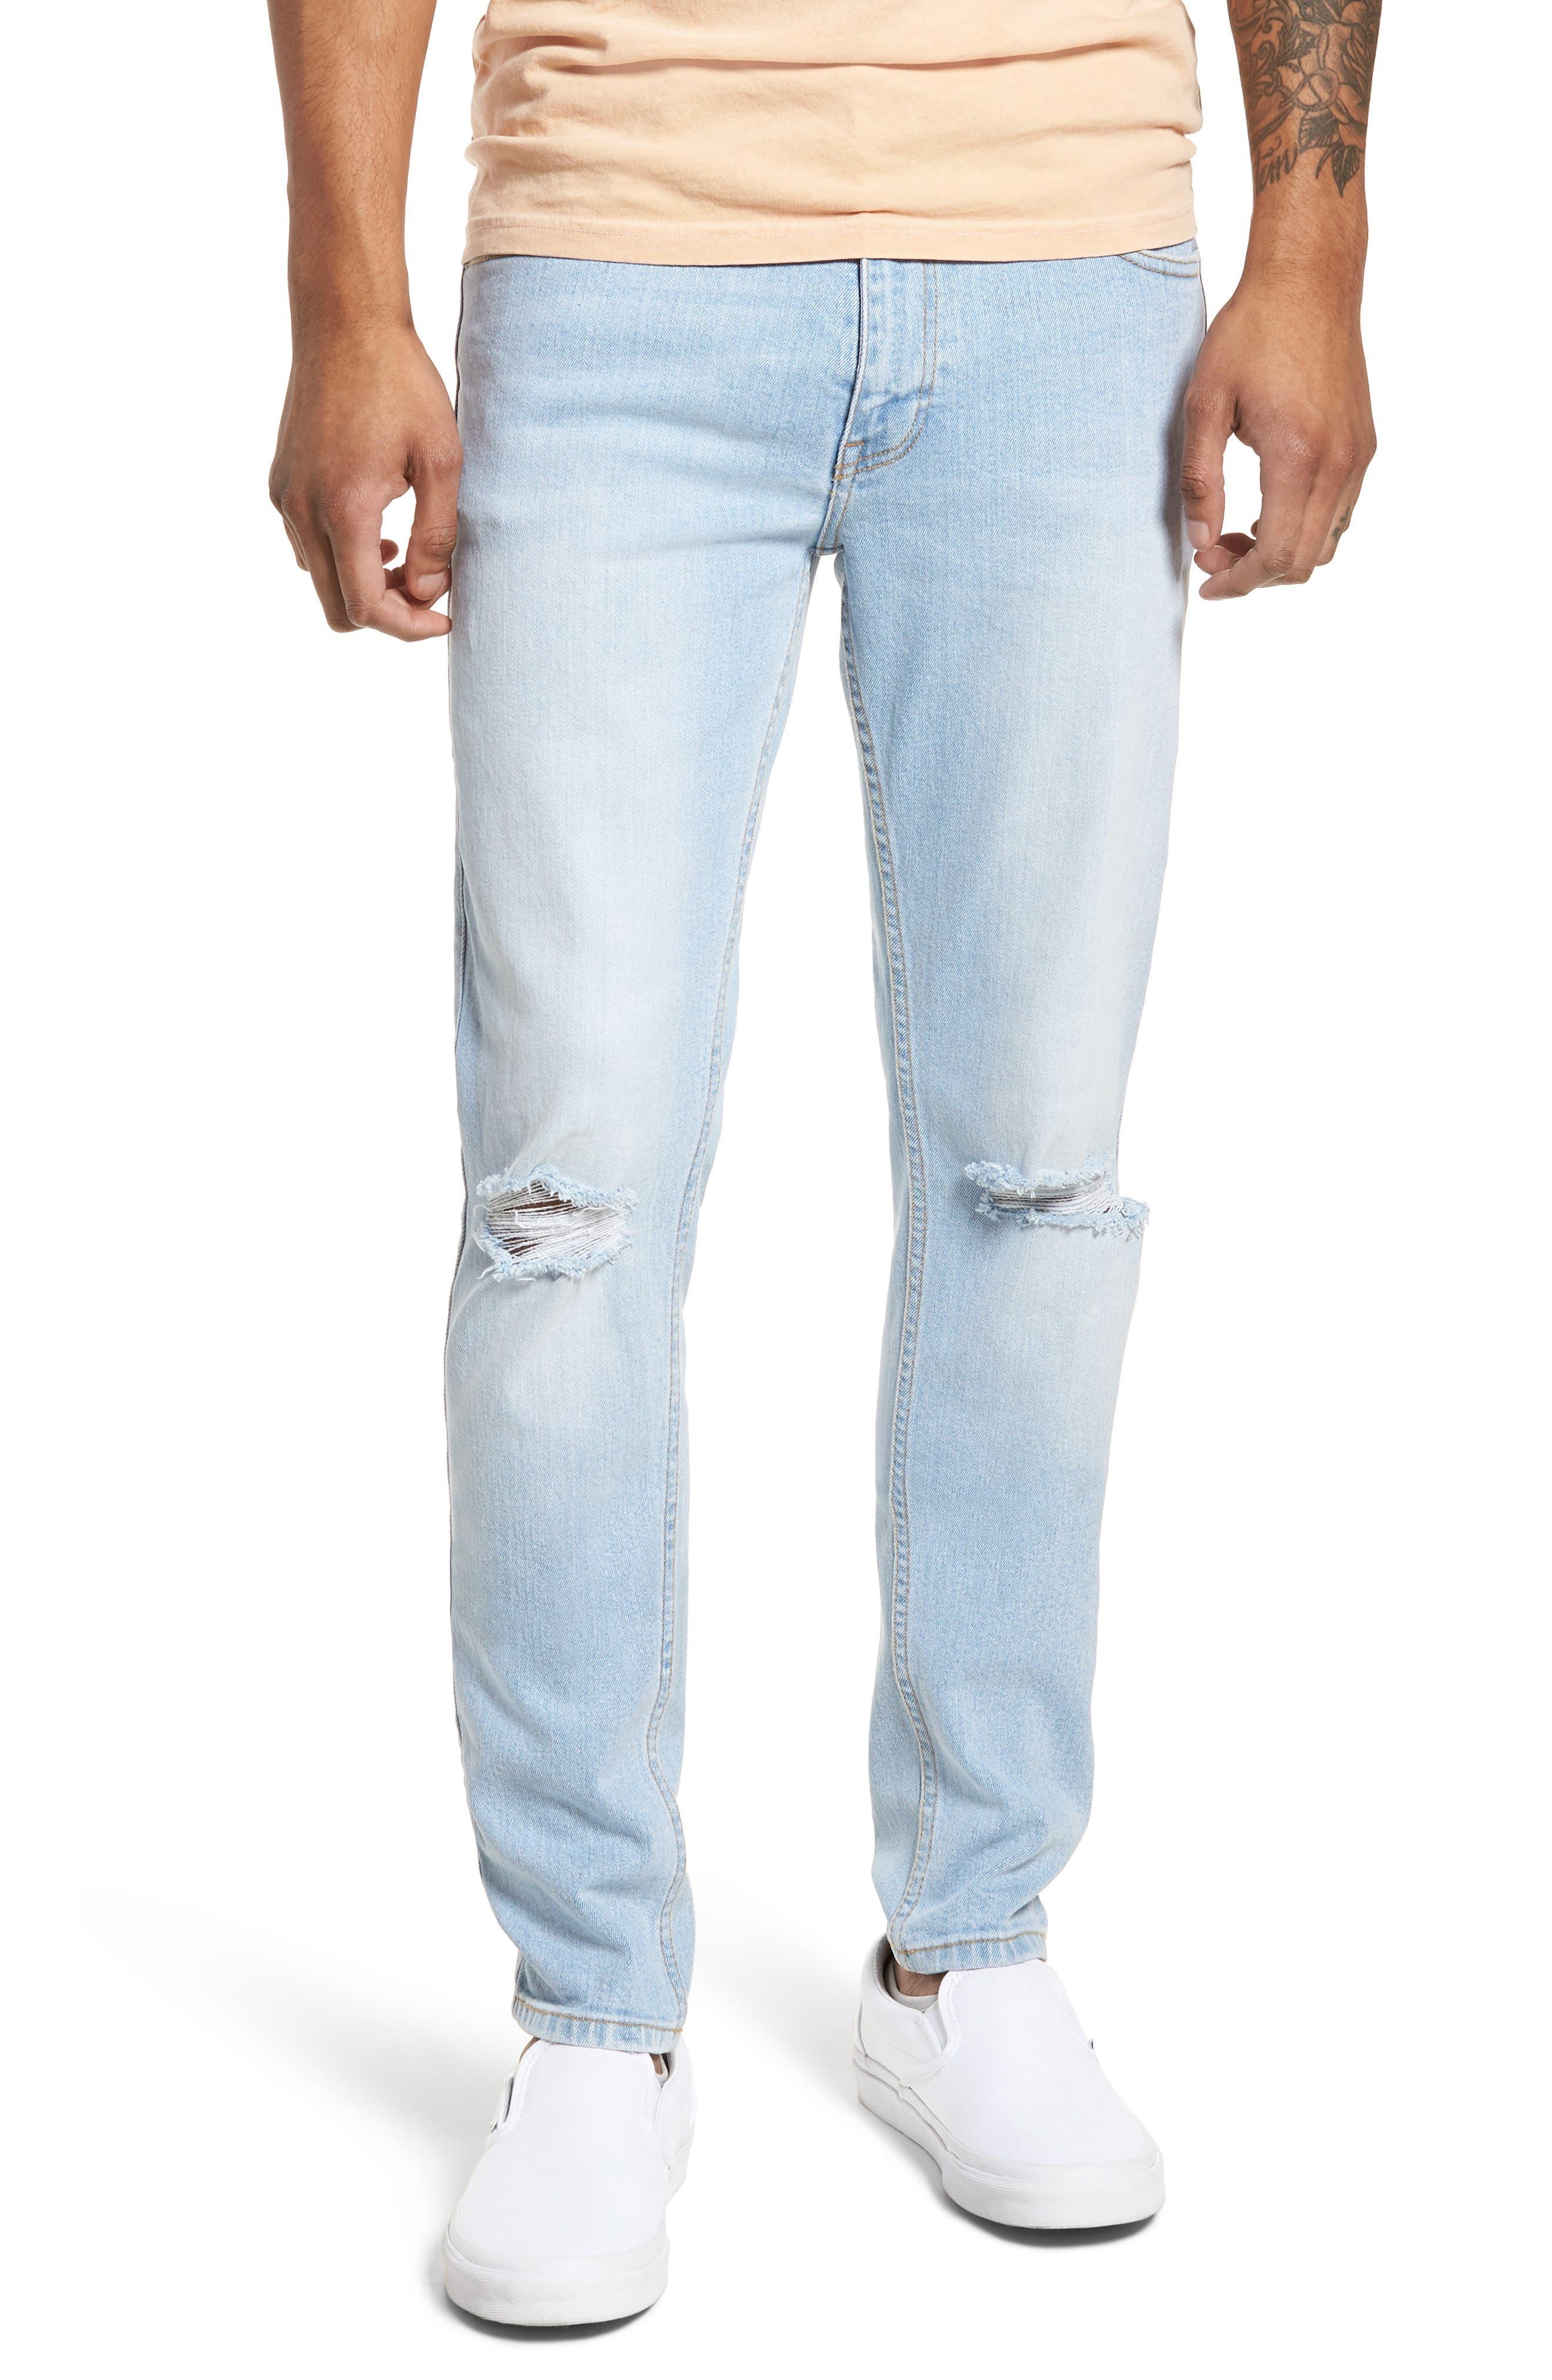 Clark Slim Straight Leg Jeans,                             Main thumbnail 1, color,                             Superlight Blue Ripped